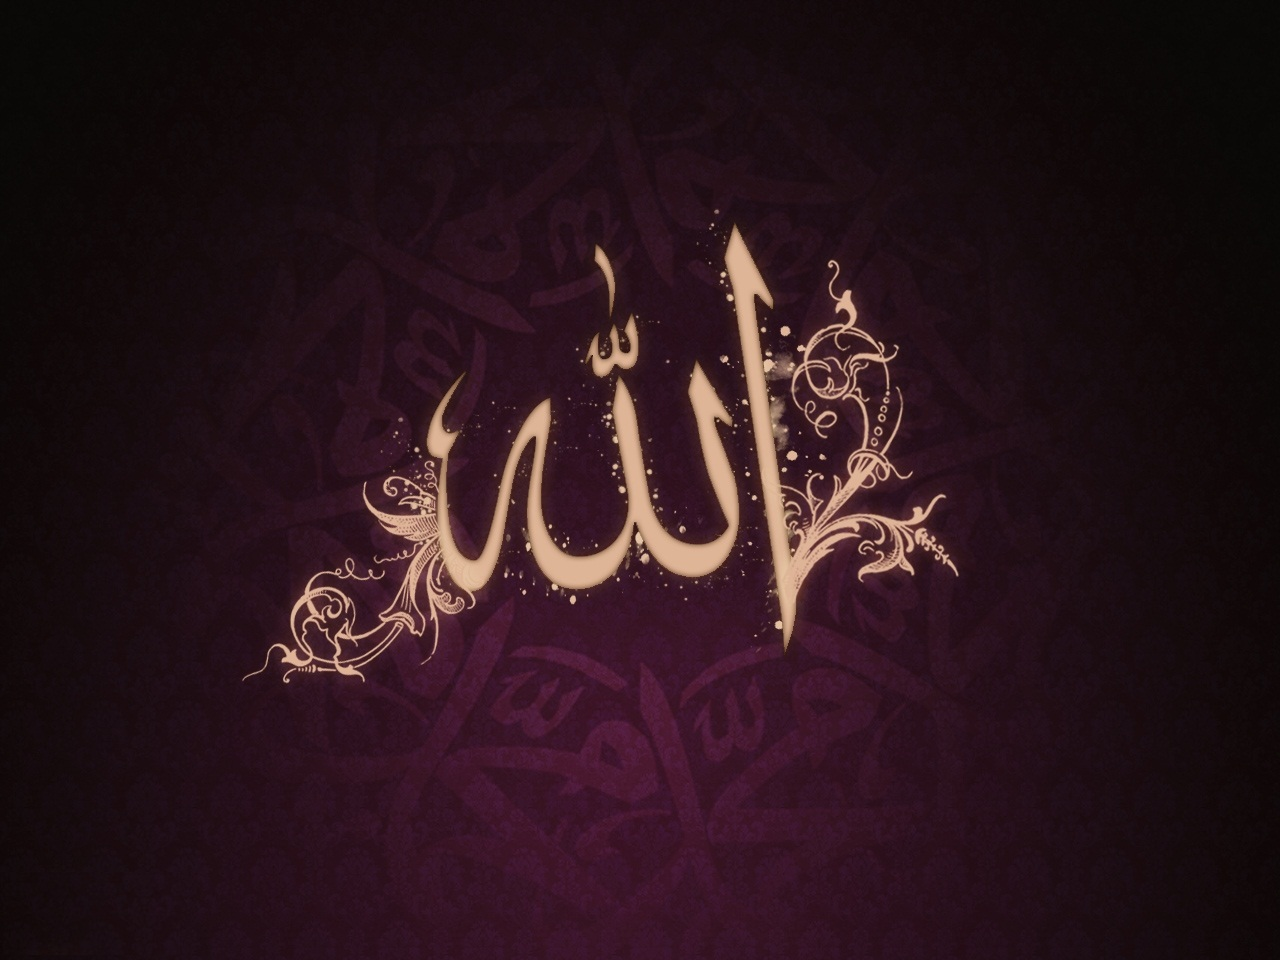 Lord Allah HD Wallpapers ~ God wallpaper hd